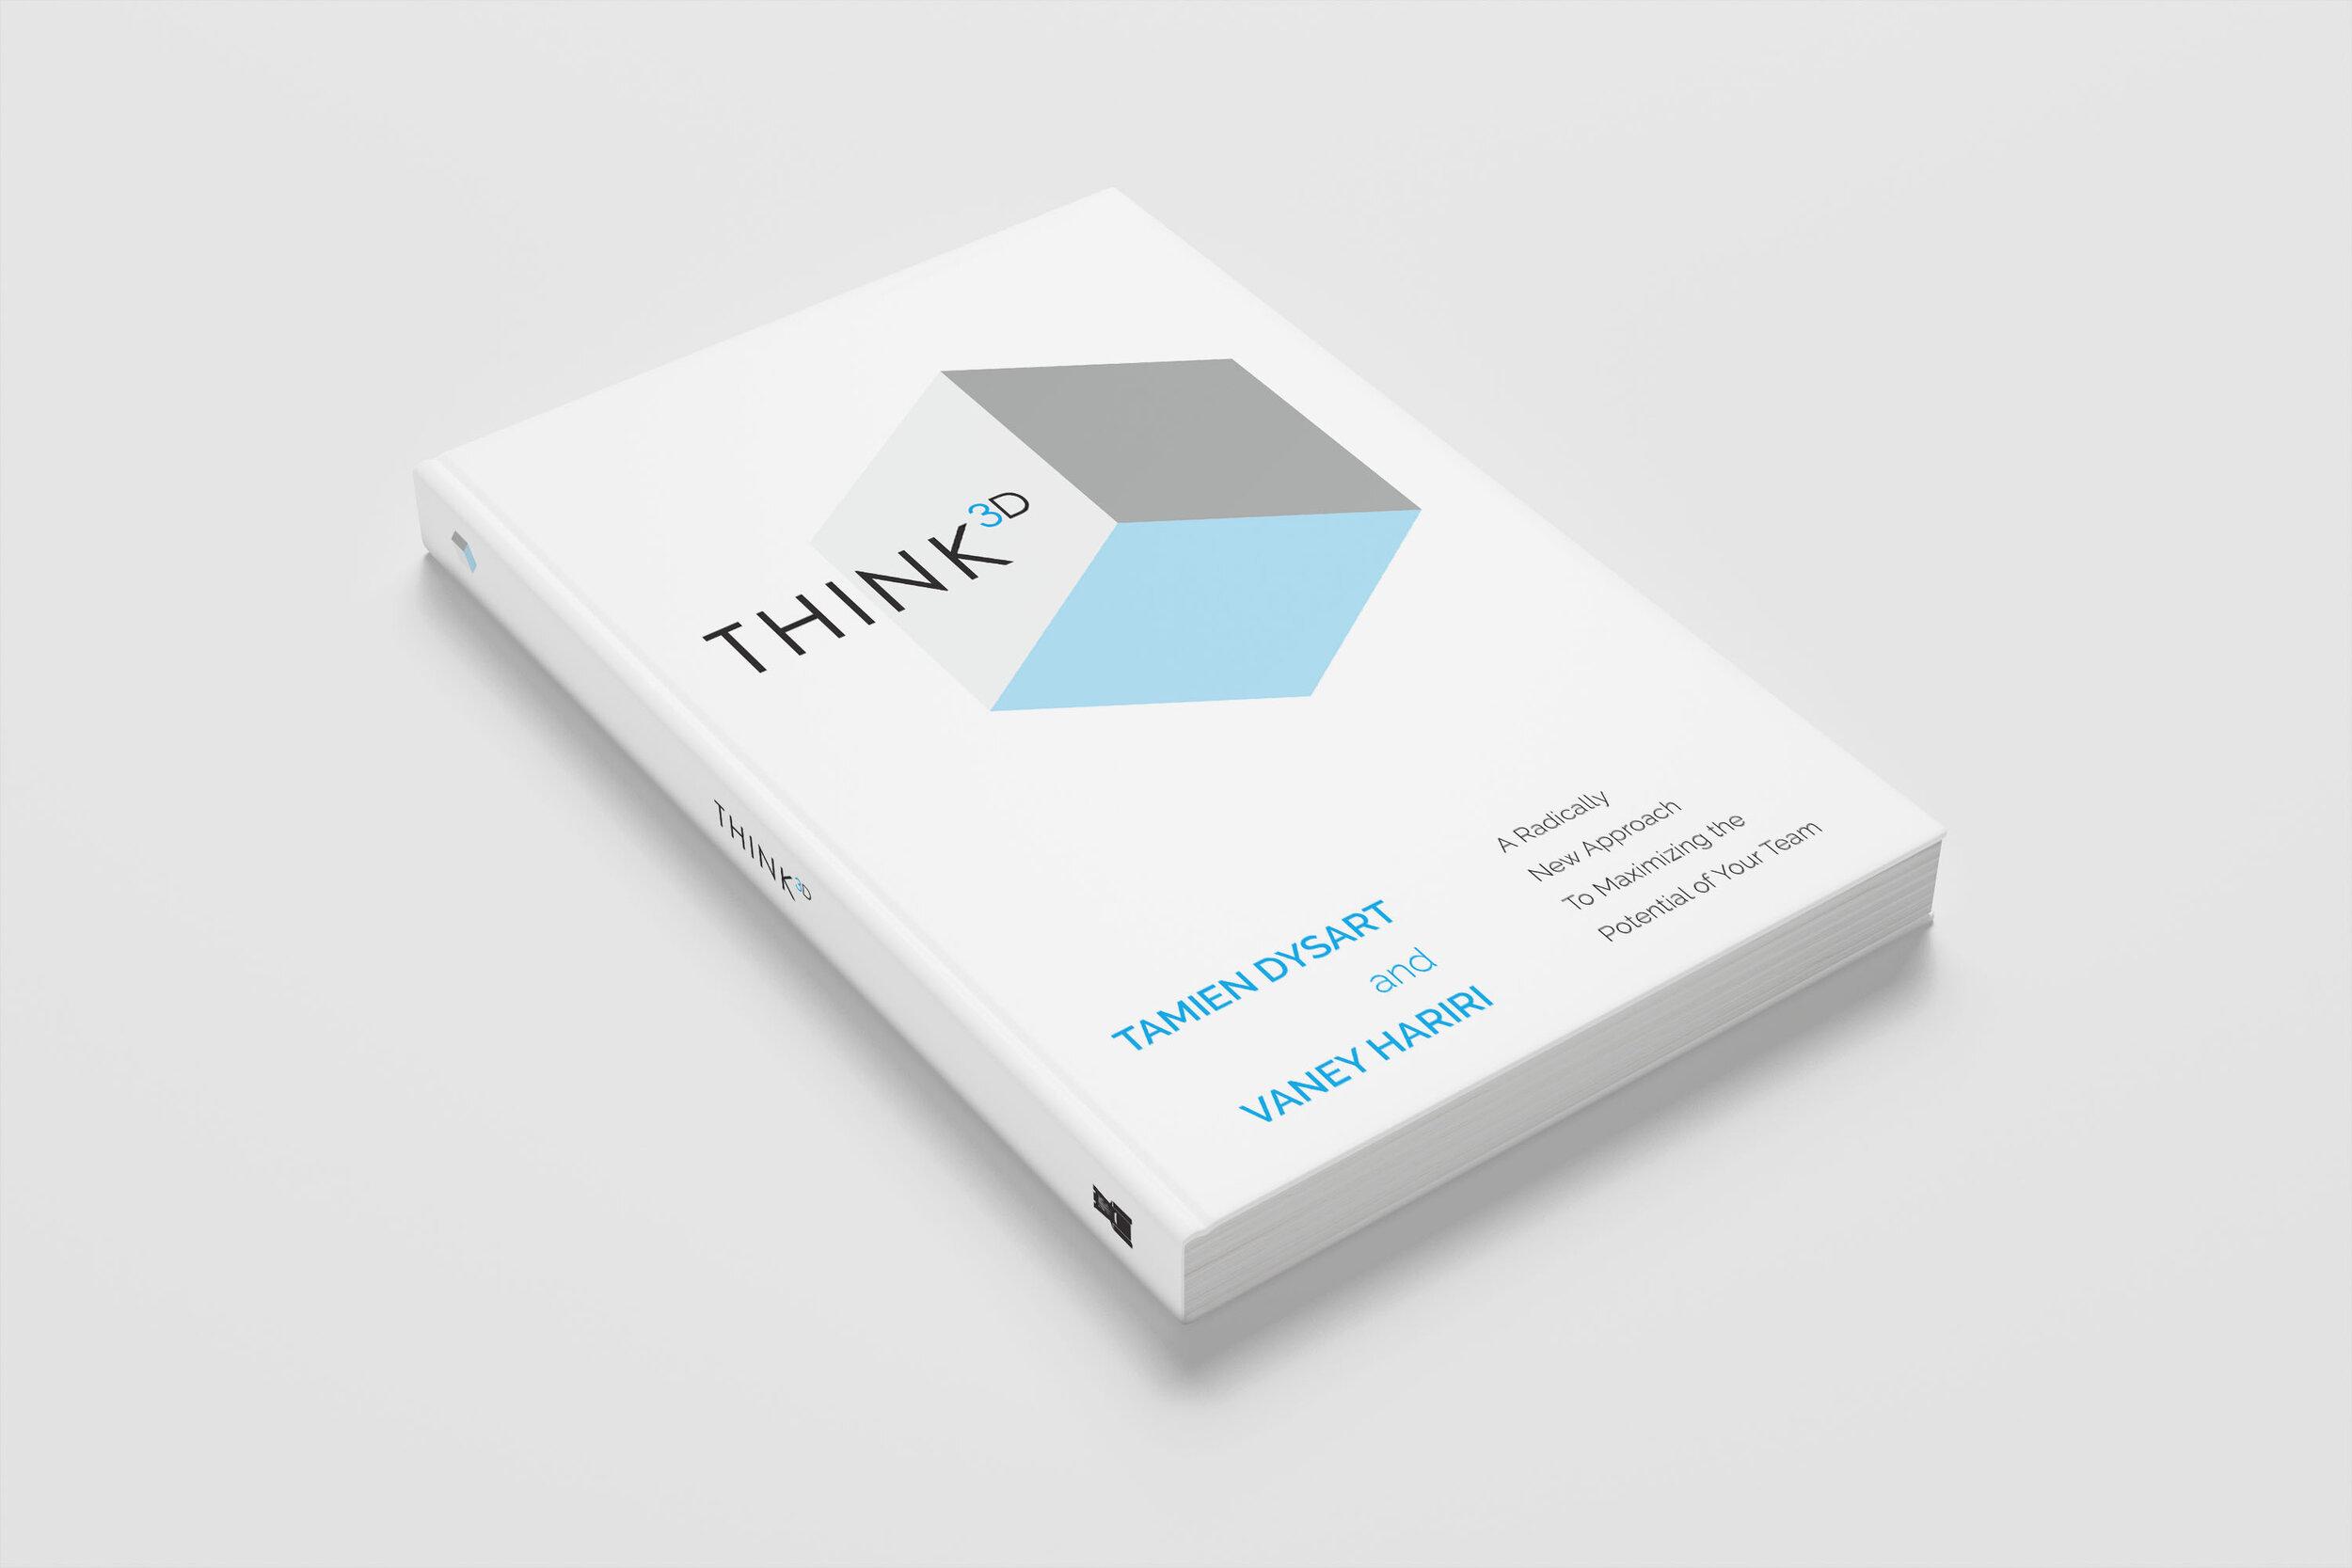 Throne_Think-3D_Cover_2.jpg